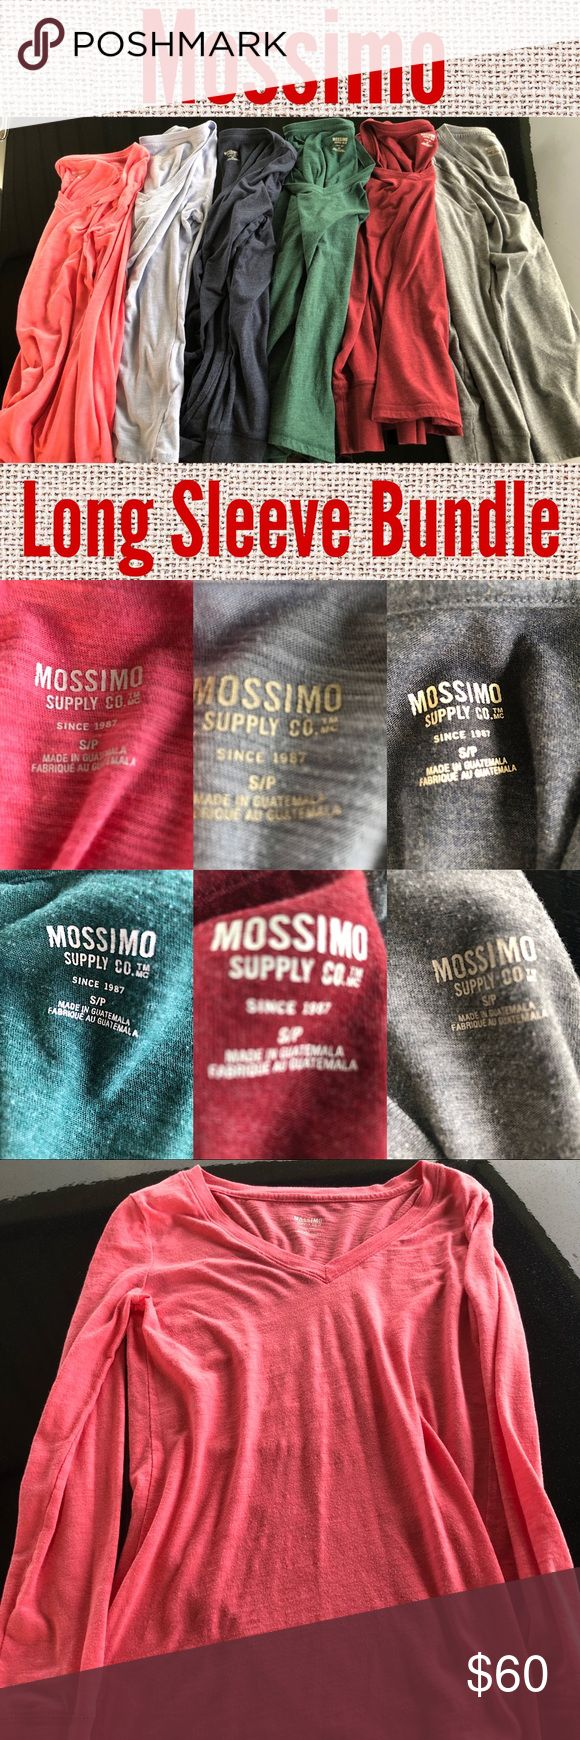 2631 Best My Posh Picks Images On Pinterest Rodeo Bundling 6 Mossimo Long Sleeve Vneck Bundle